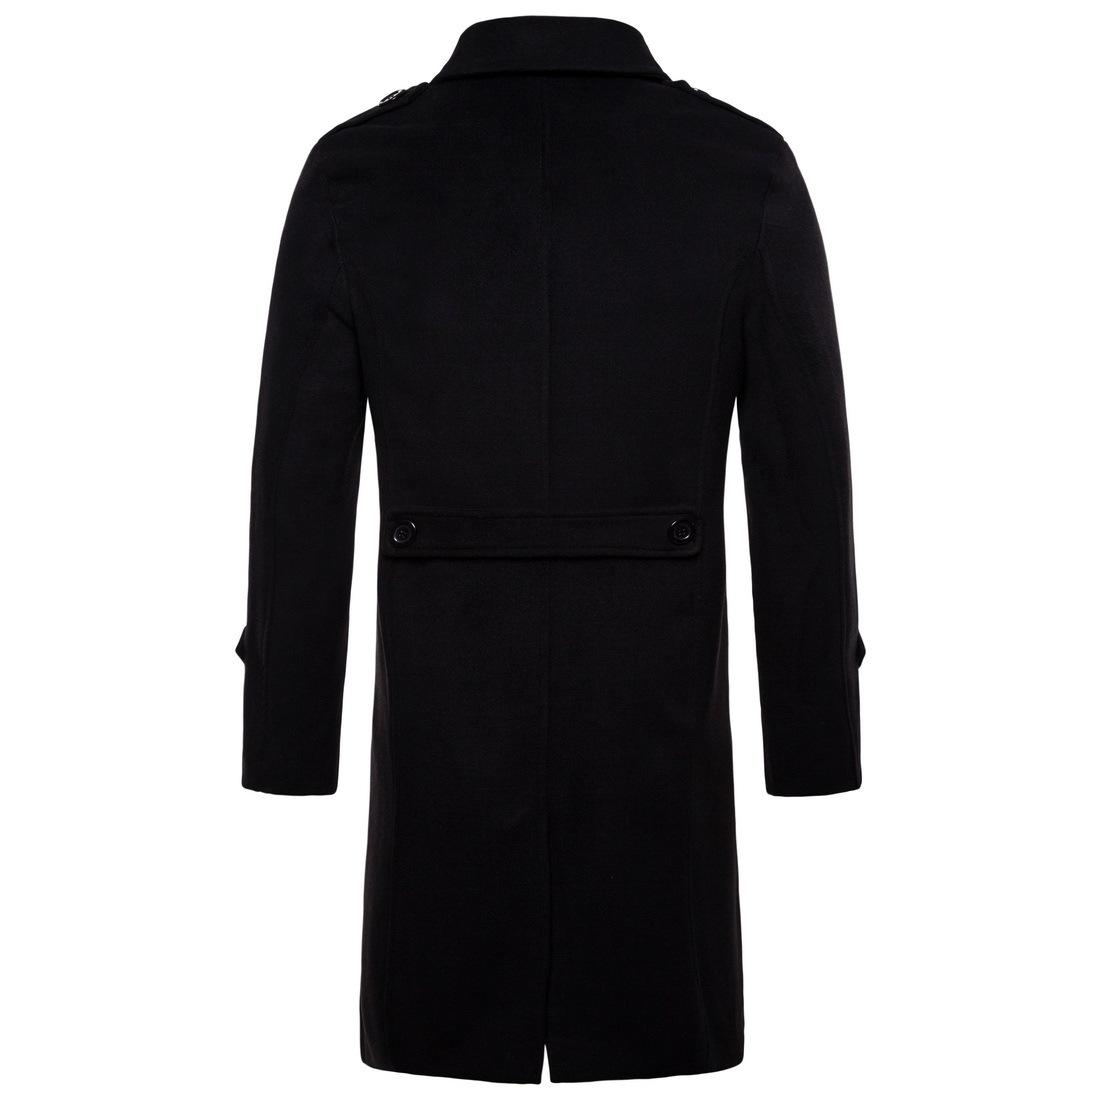 a8422e01b4b80 2019 Casual England Style Mens Long Coats 2018 Winter Fashion Warm ...